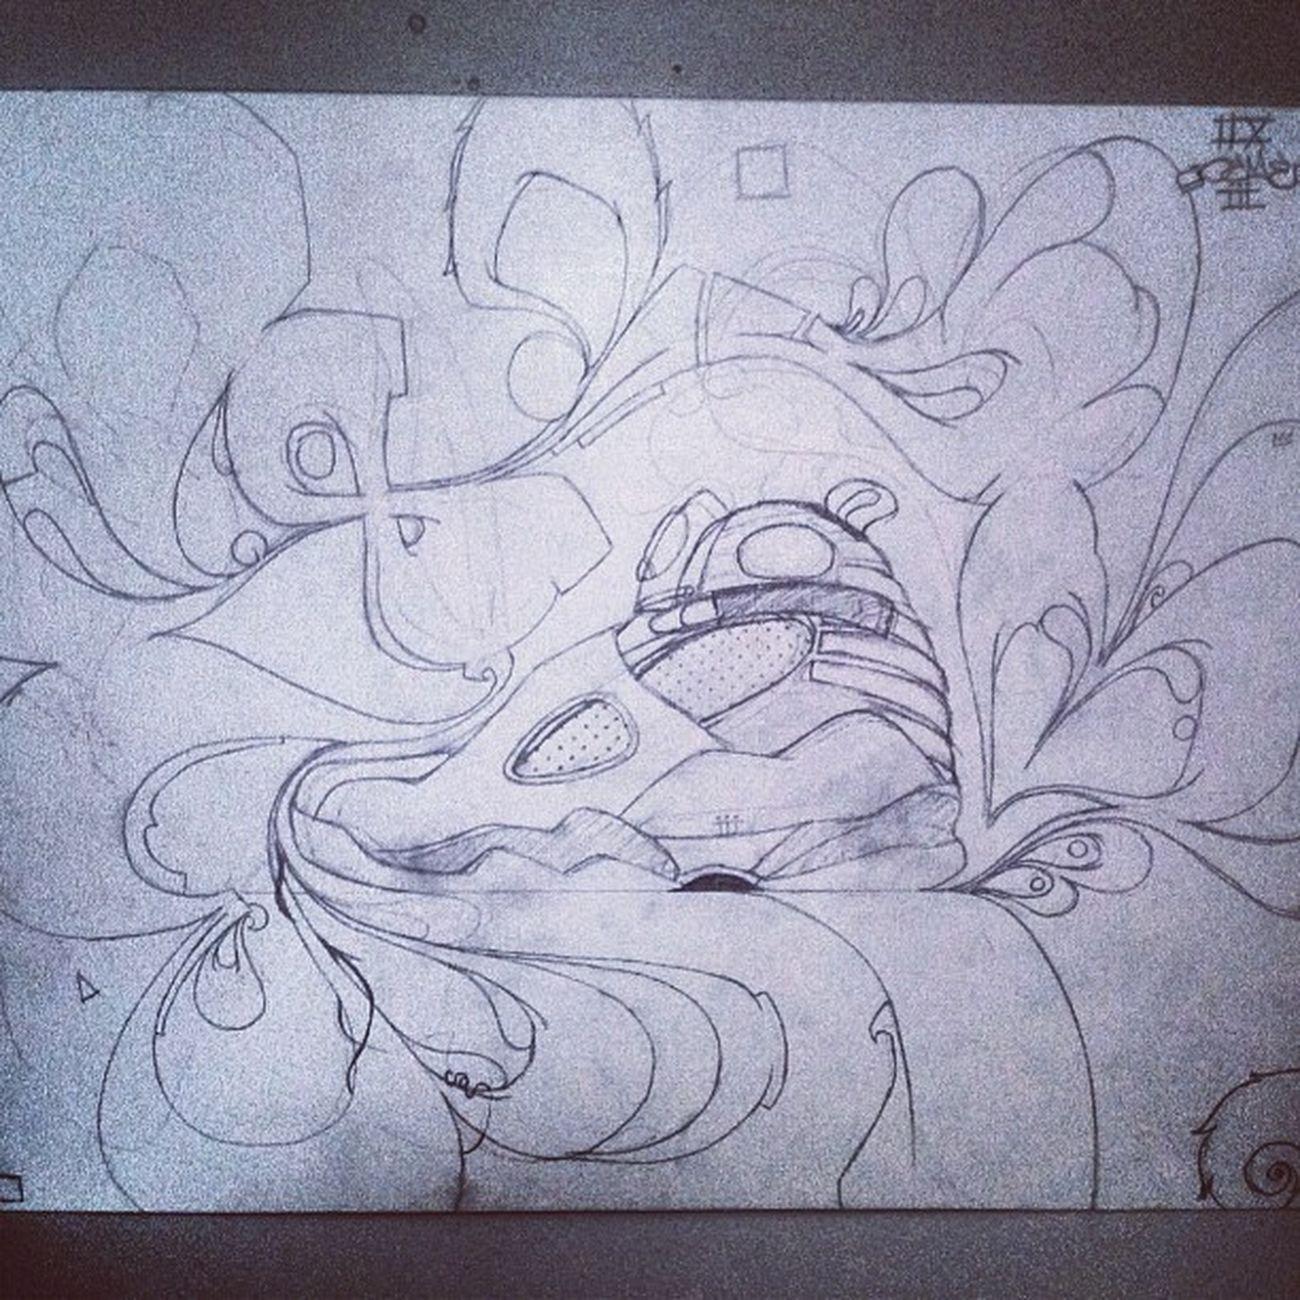 Progress on the homie @cilfone15 's piece. Jordan Jordan8 Bugsbunny Nike art artwork paint draw igers ighub igdaily instagood graffiti drawing iii sg